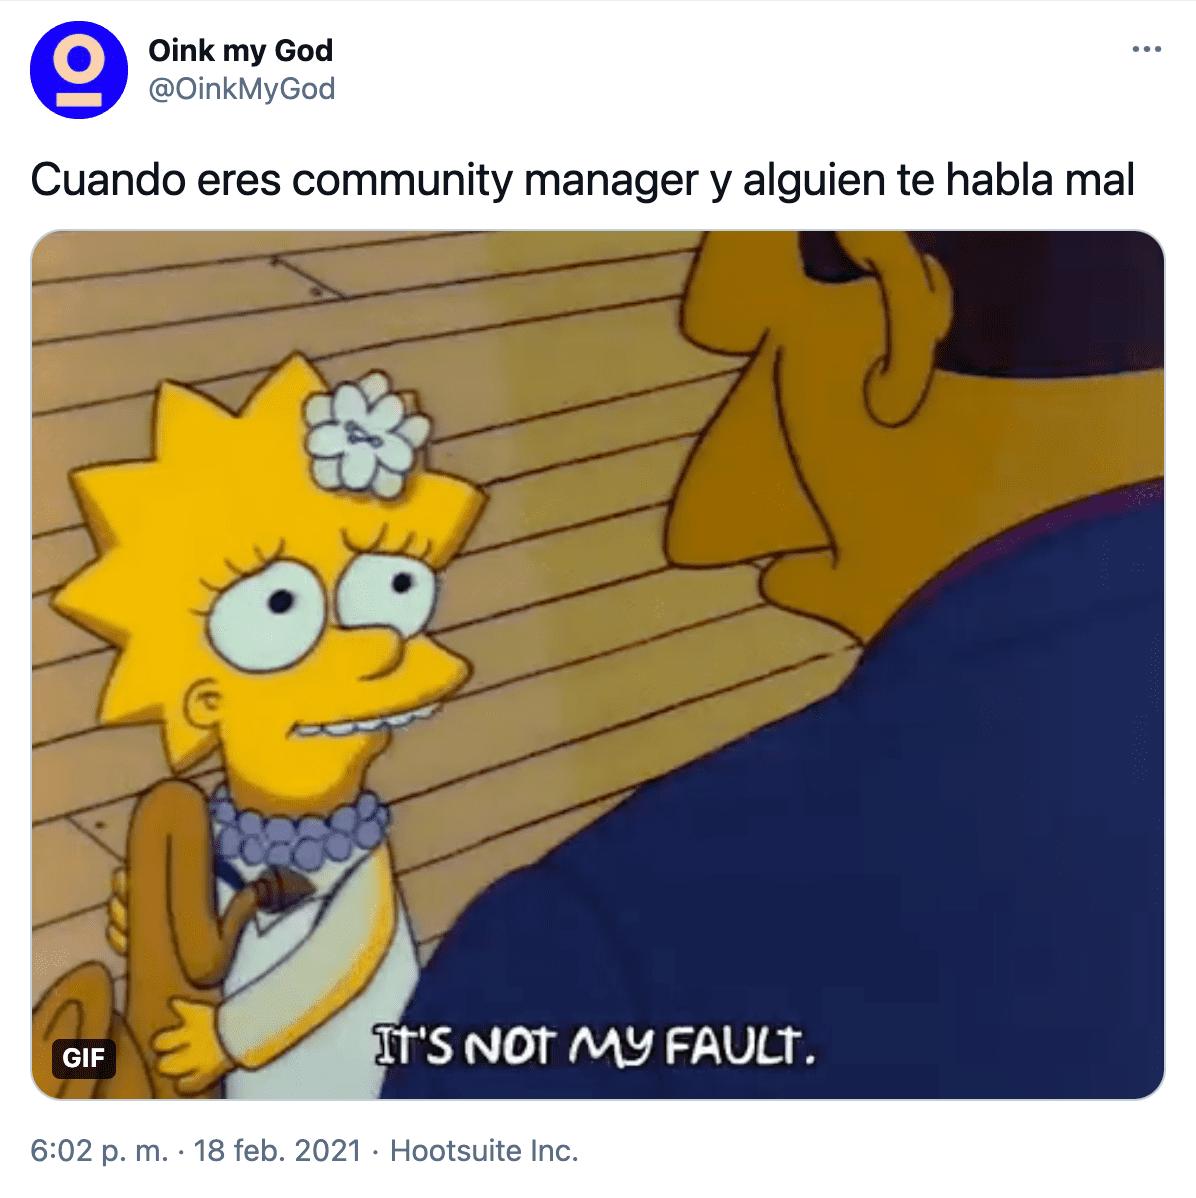 estrategia marketing twitter Oink contenido divertido meme